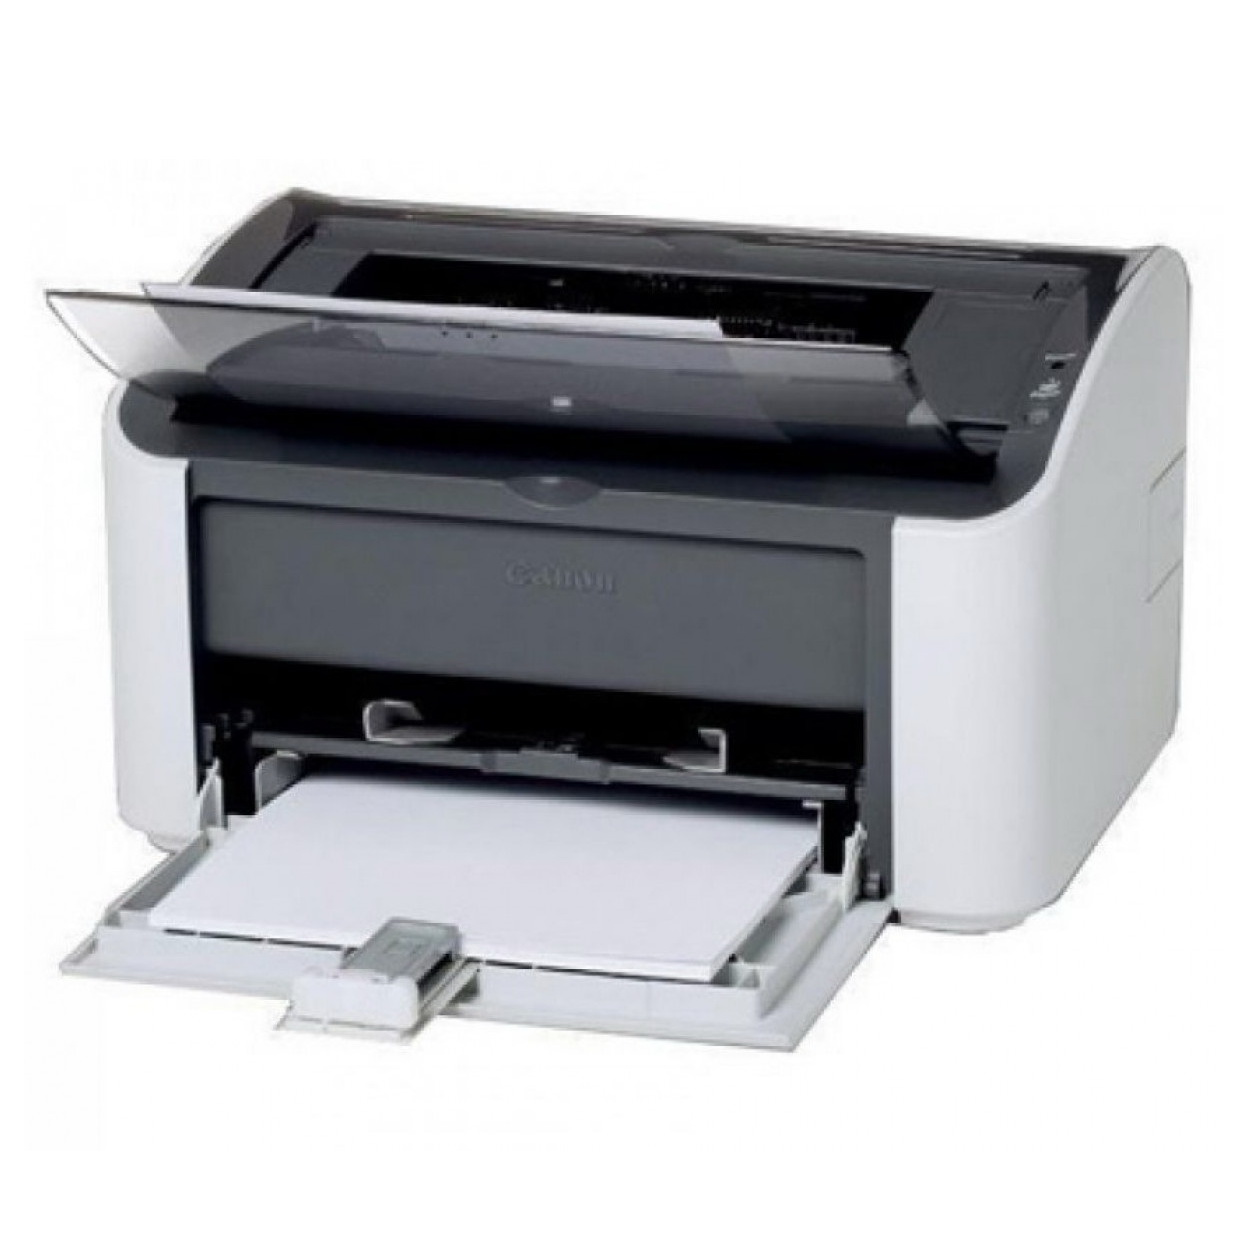 Buy Canon Lasershot Lbp 2900b Monochrome Laser Printer